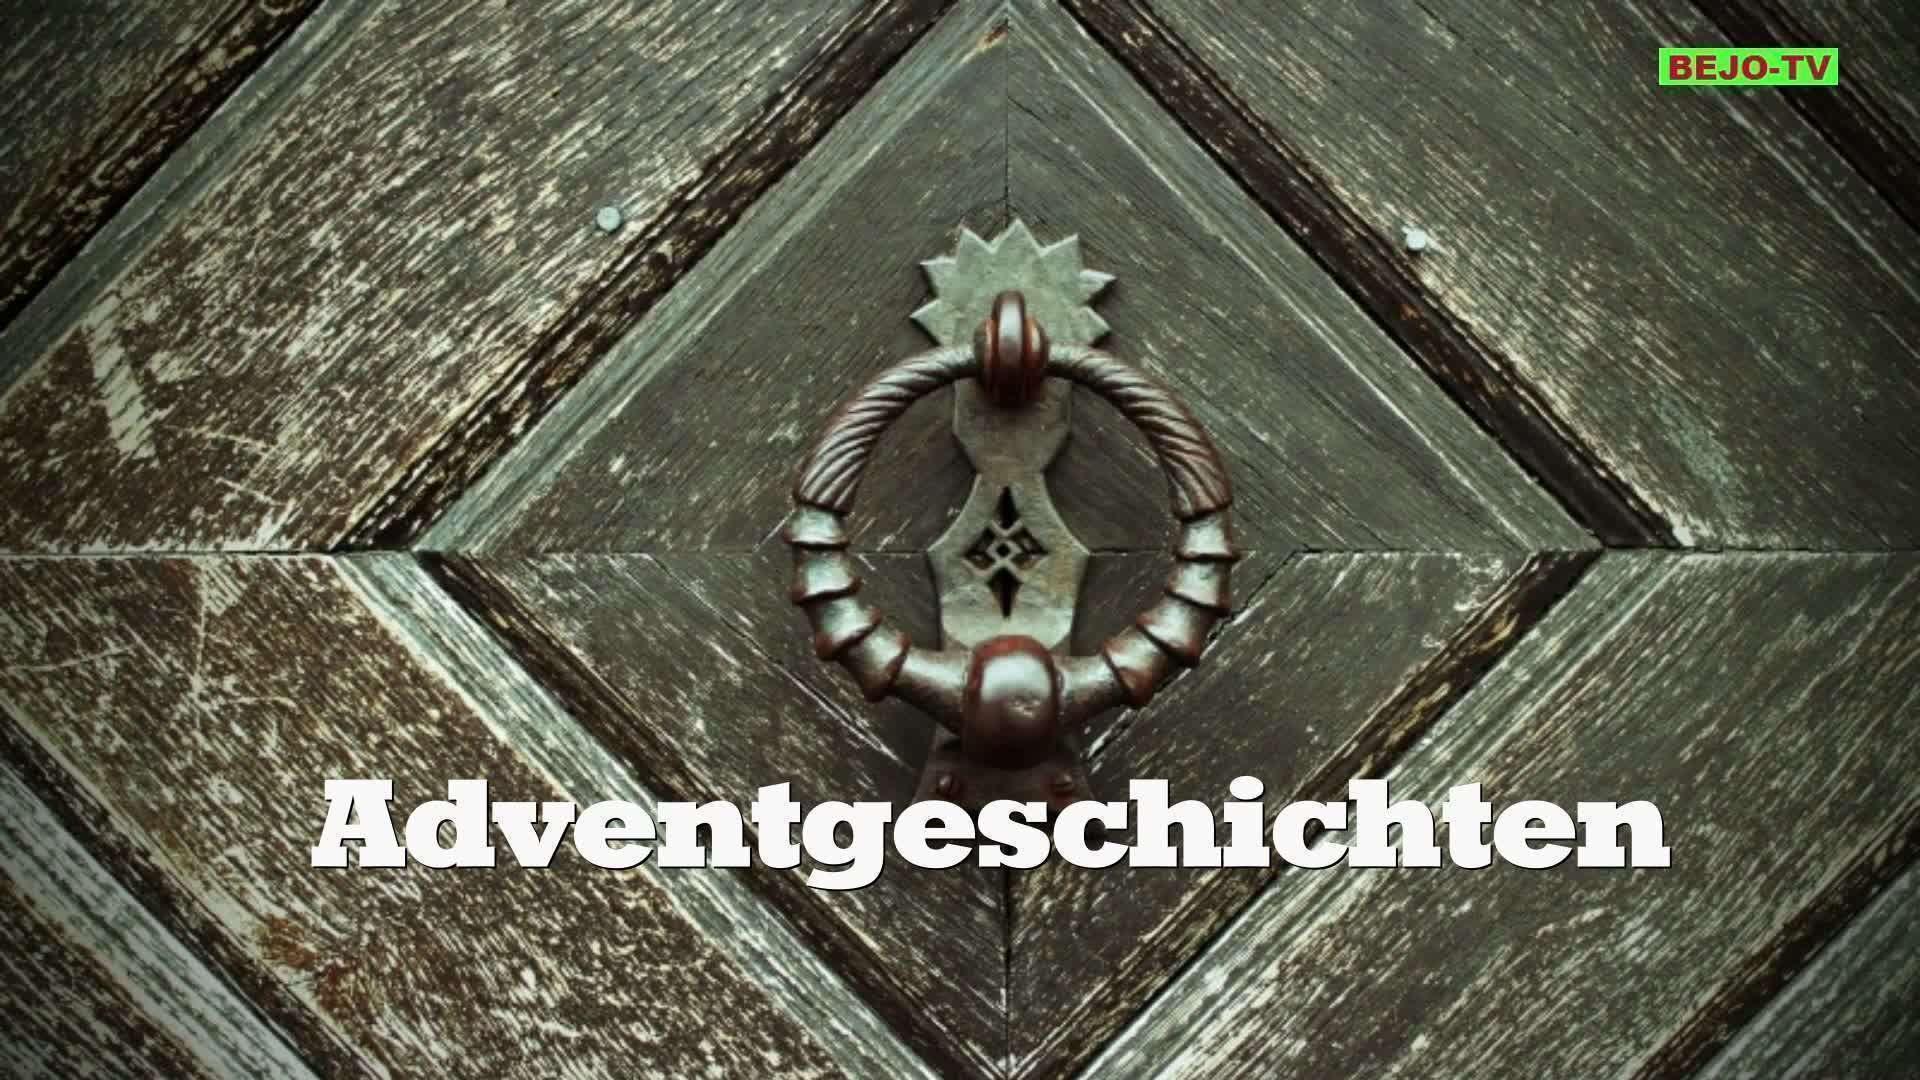 Adventgeschichten